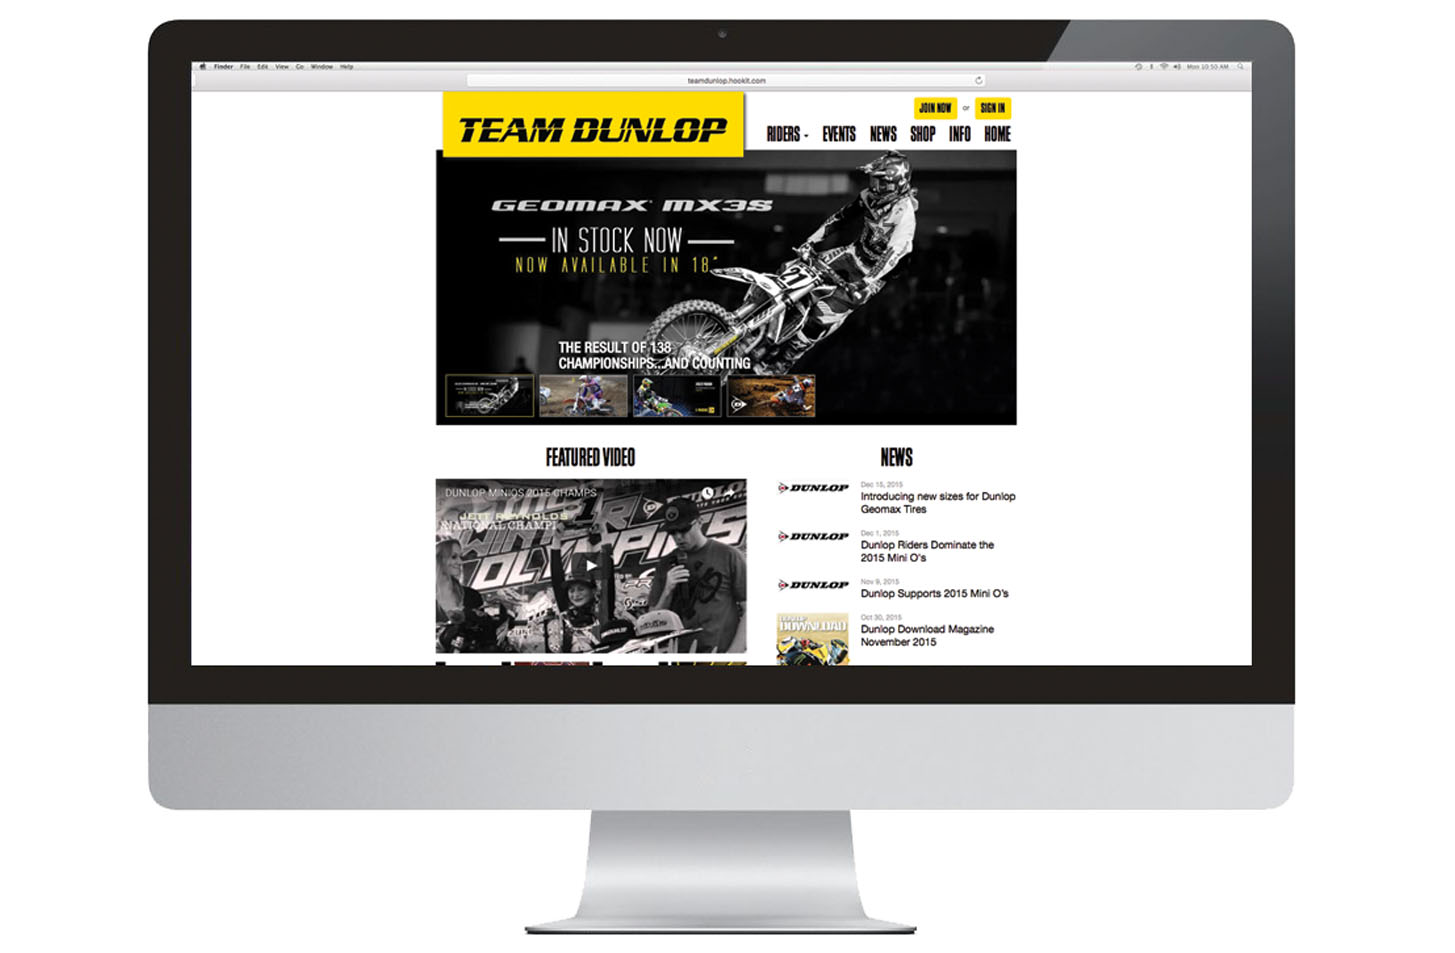 Team Dunlop amateur motocross customer loyalty program